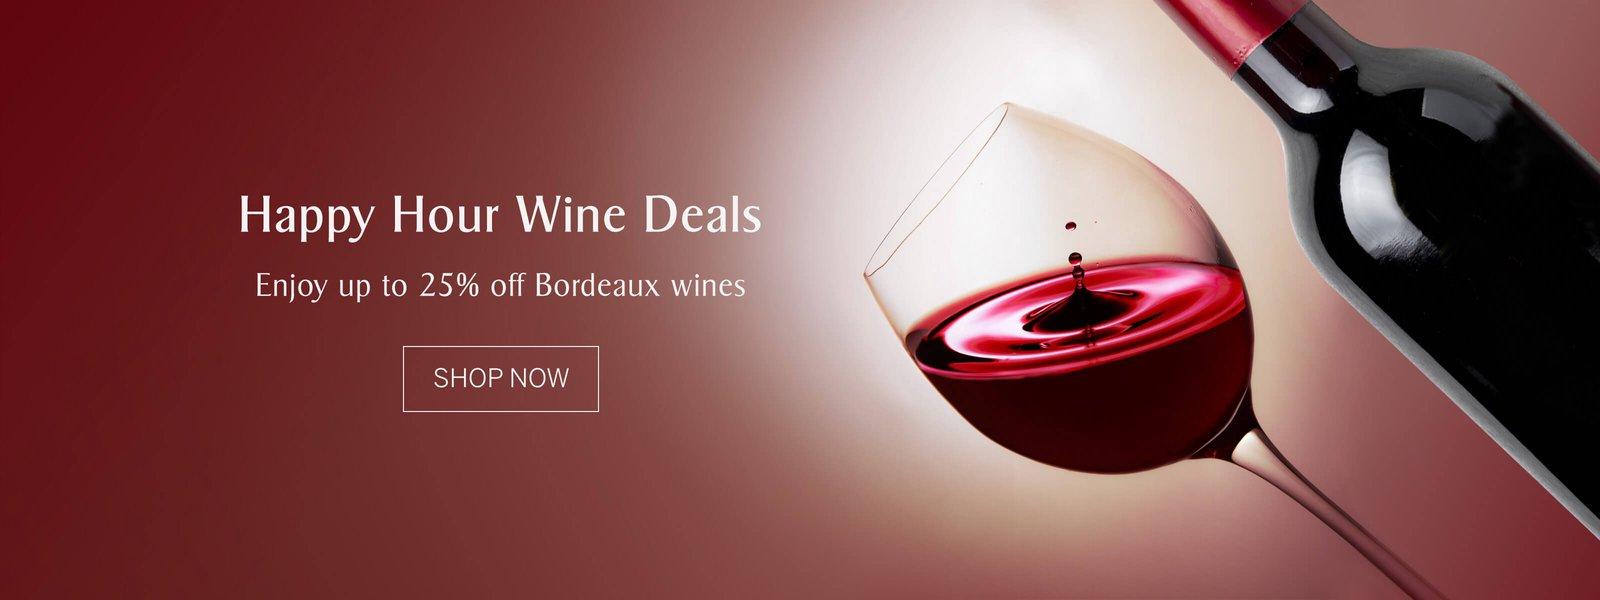 KrisShop - June Wine Deals